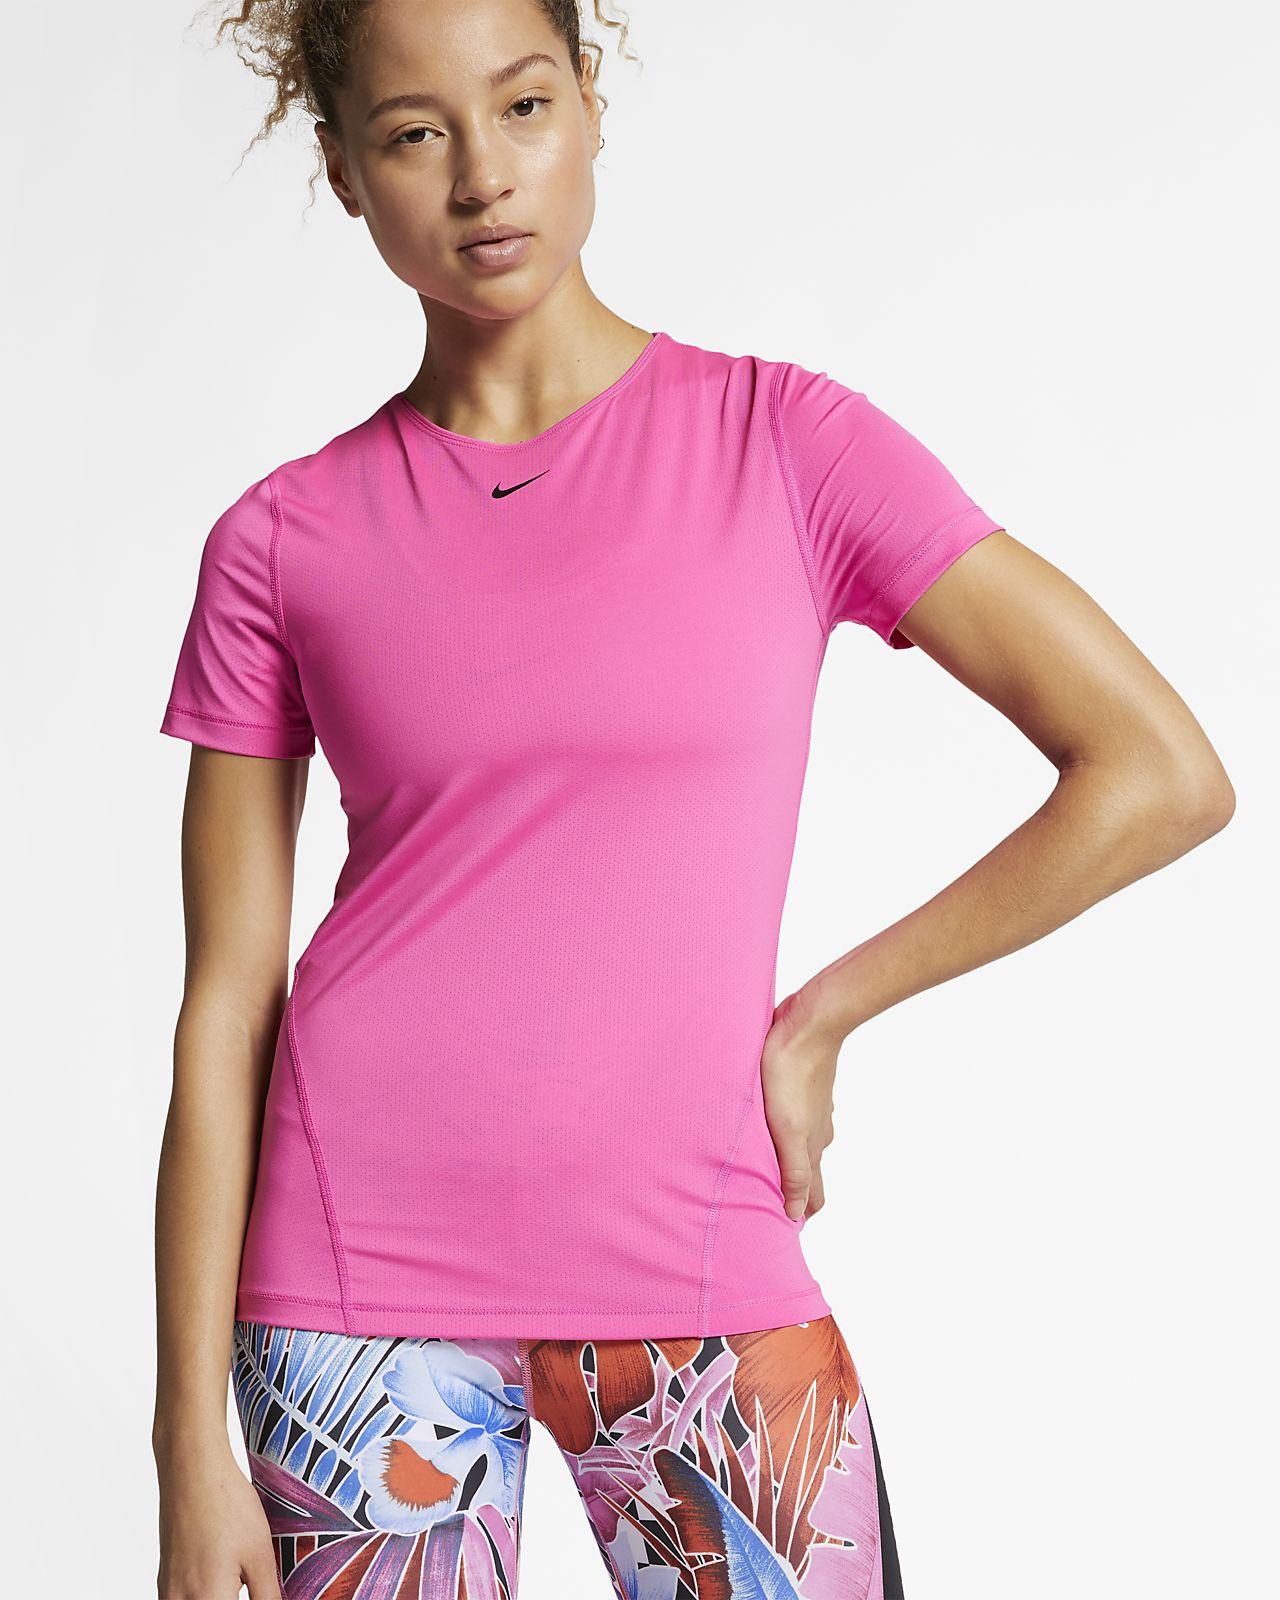 Nike Pro Kurzarm-Mesh-Trainingsoberteil für Damen